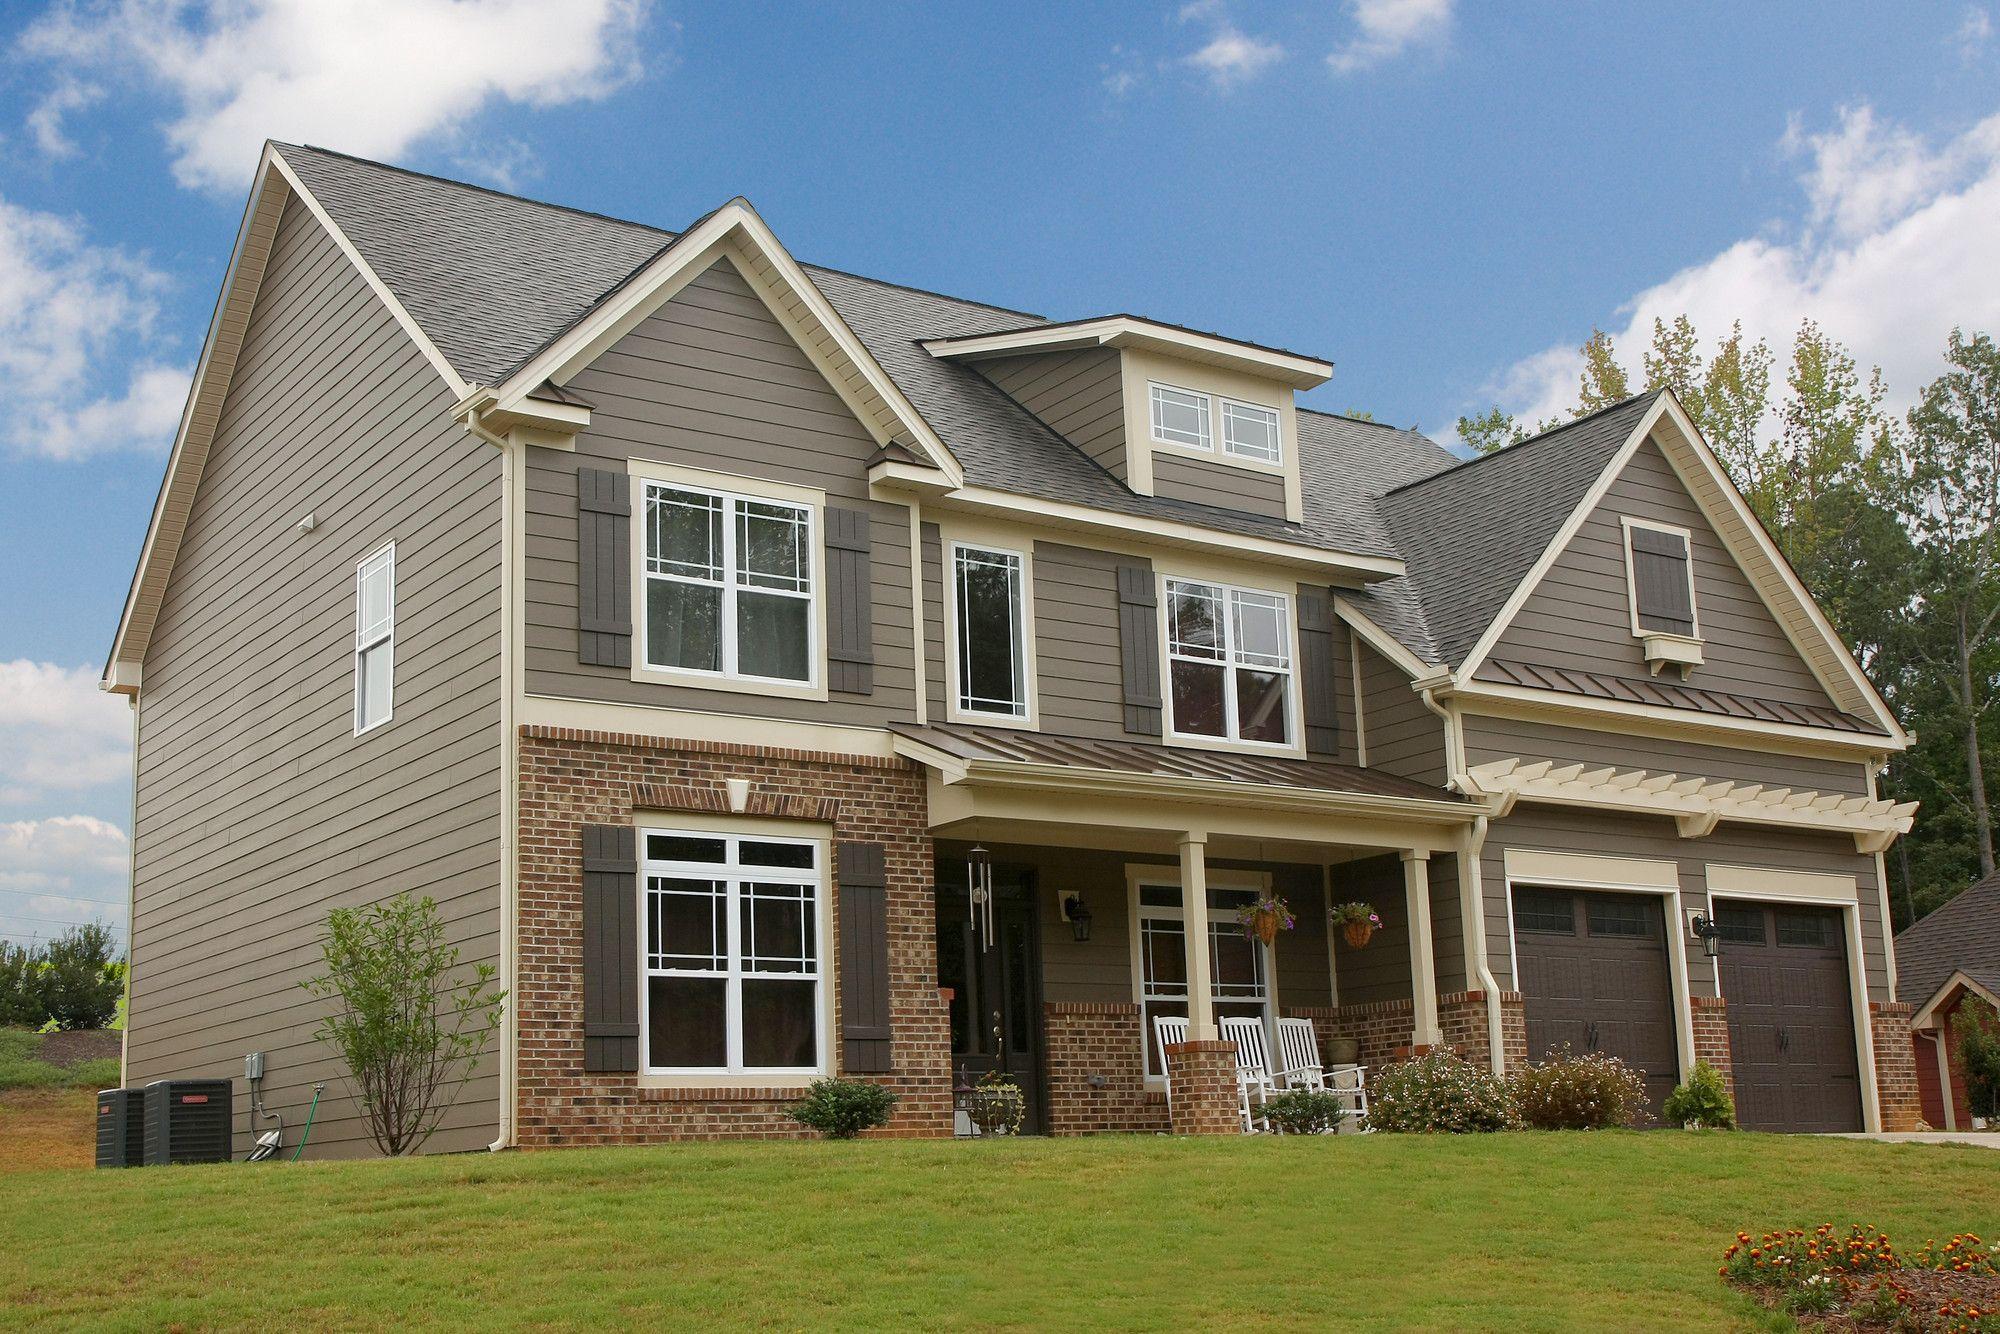 James Hardie Design Ideas Photo Showcase Exterior Paint Colors For House Exterior House Siding House Siding